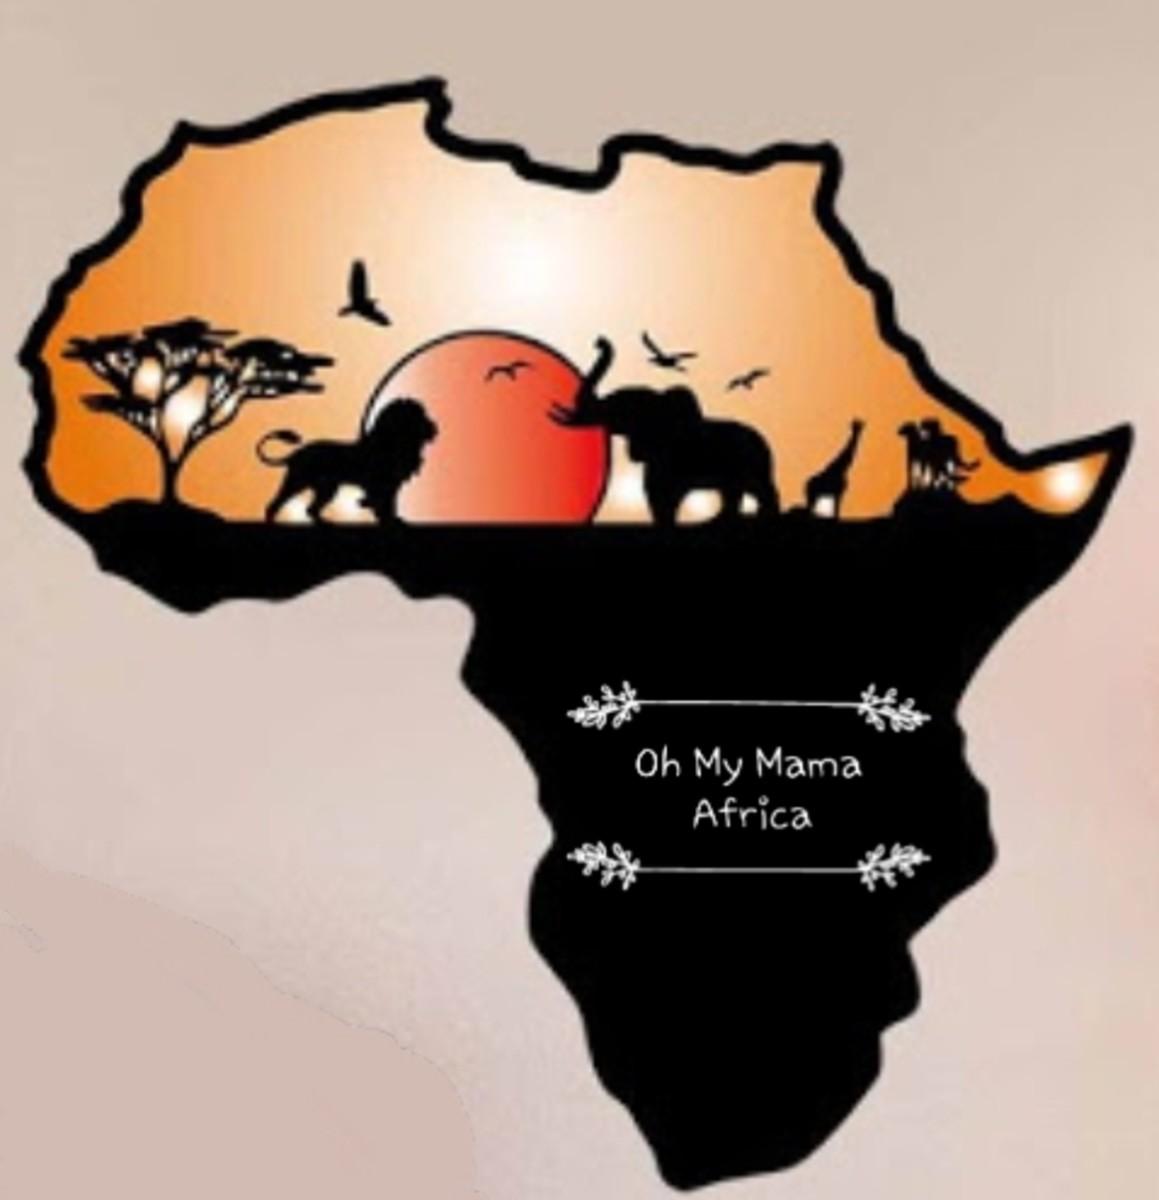 Oh My Mama Africa